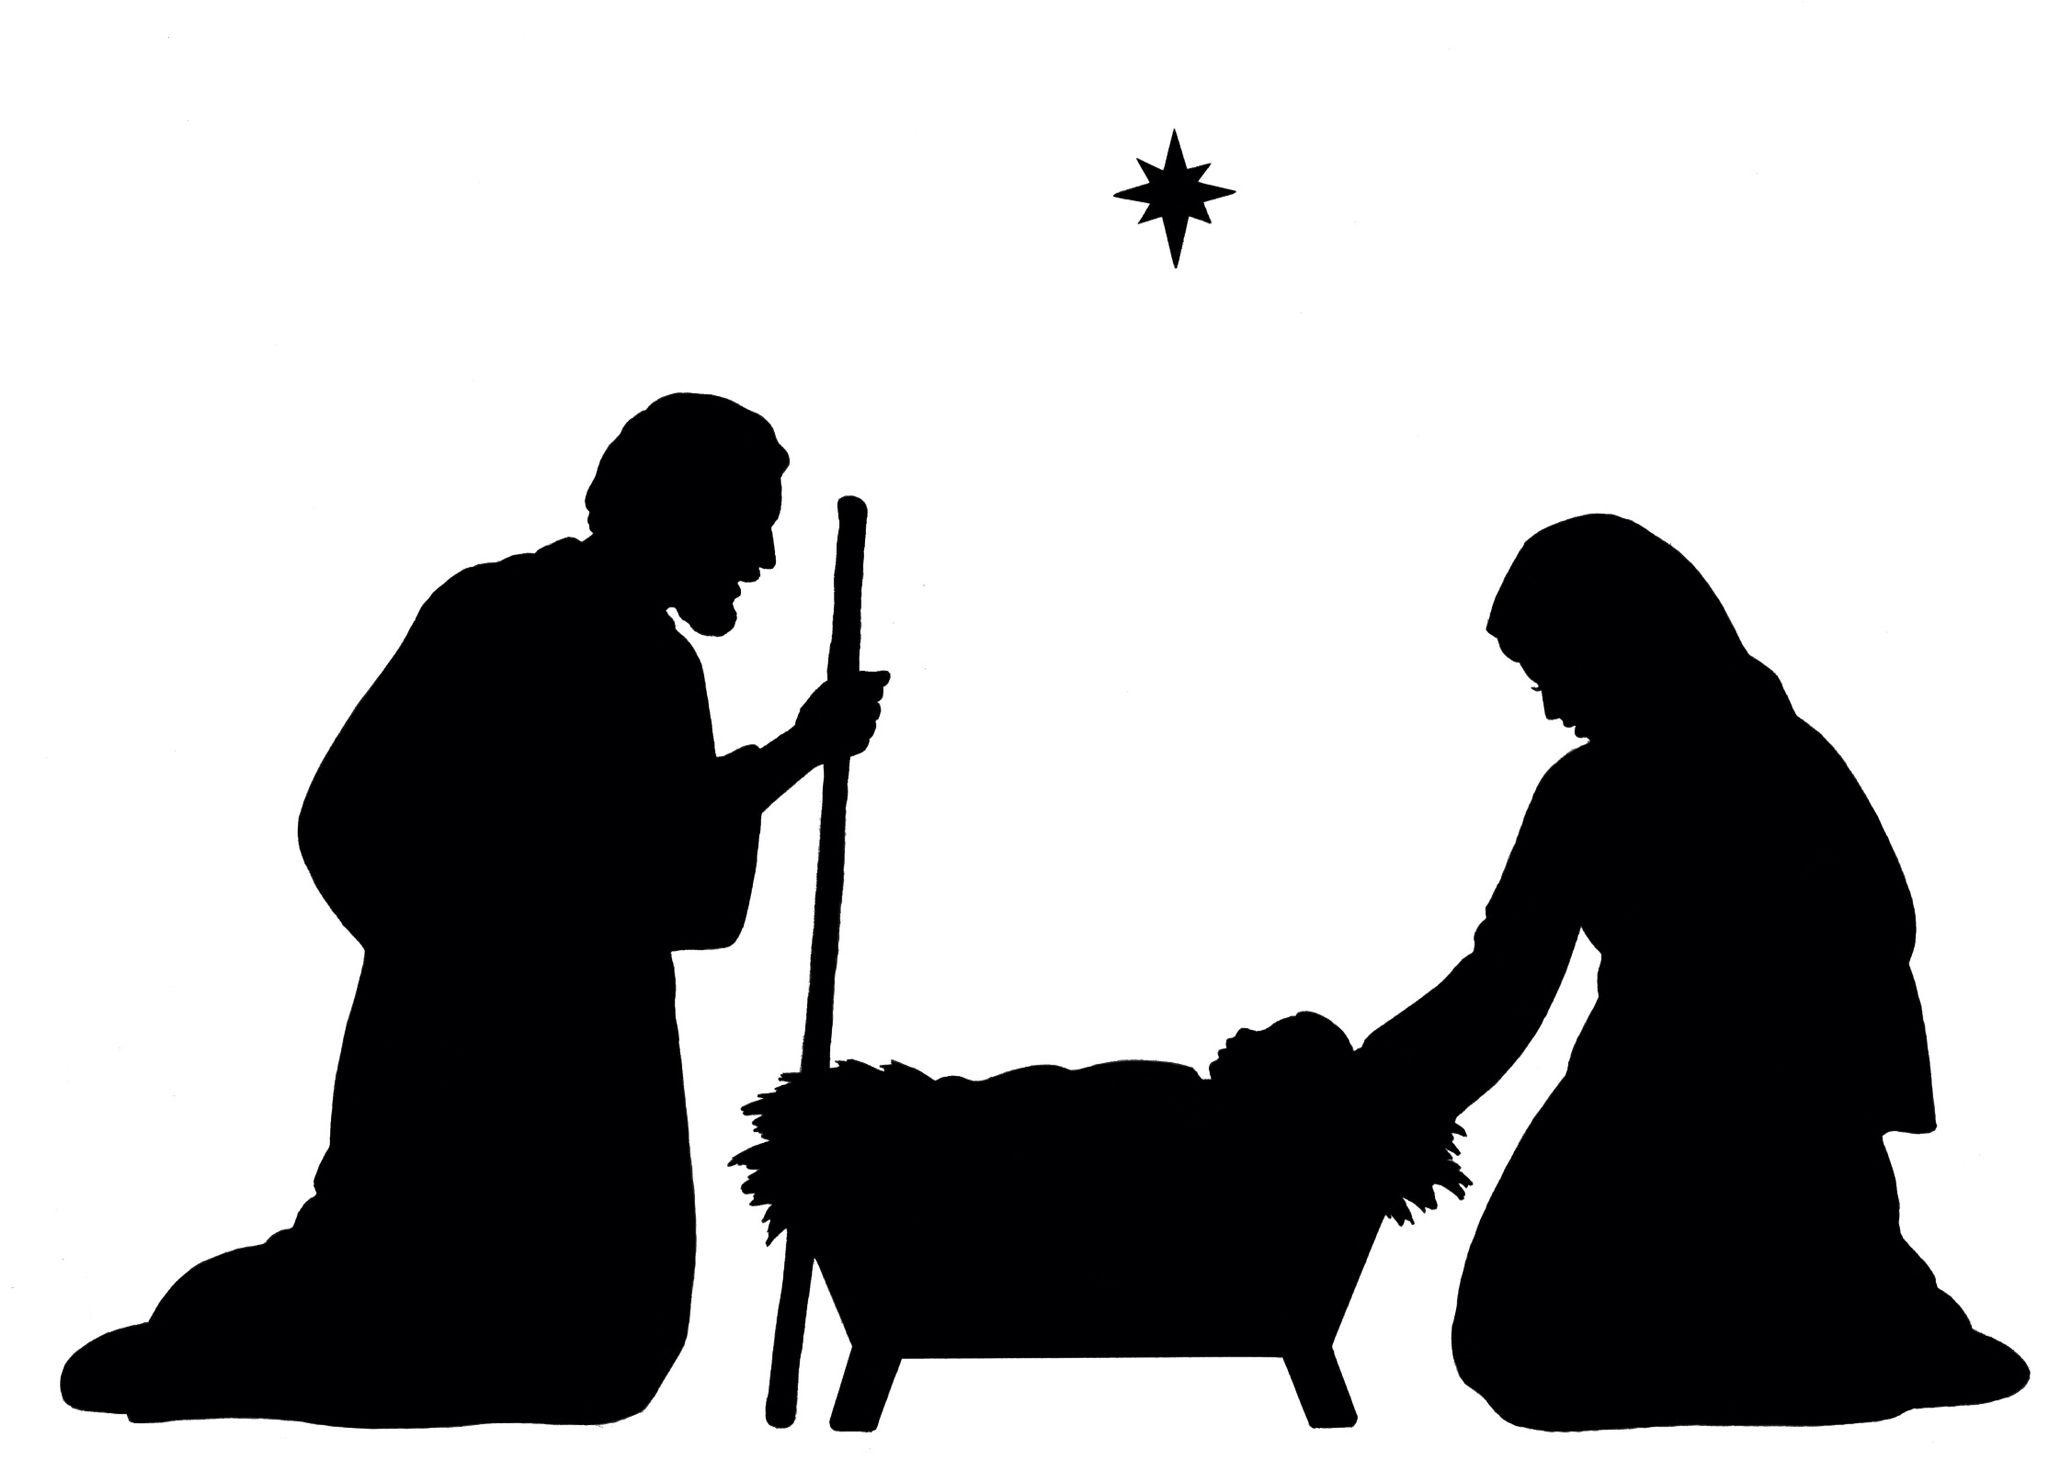 2048x1470 Nacimiento Sud Lds Navidad, Silhouettes And Cricut